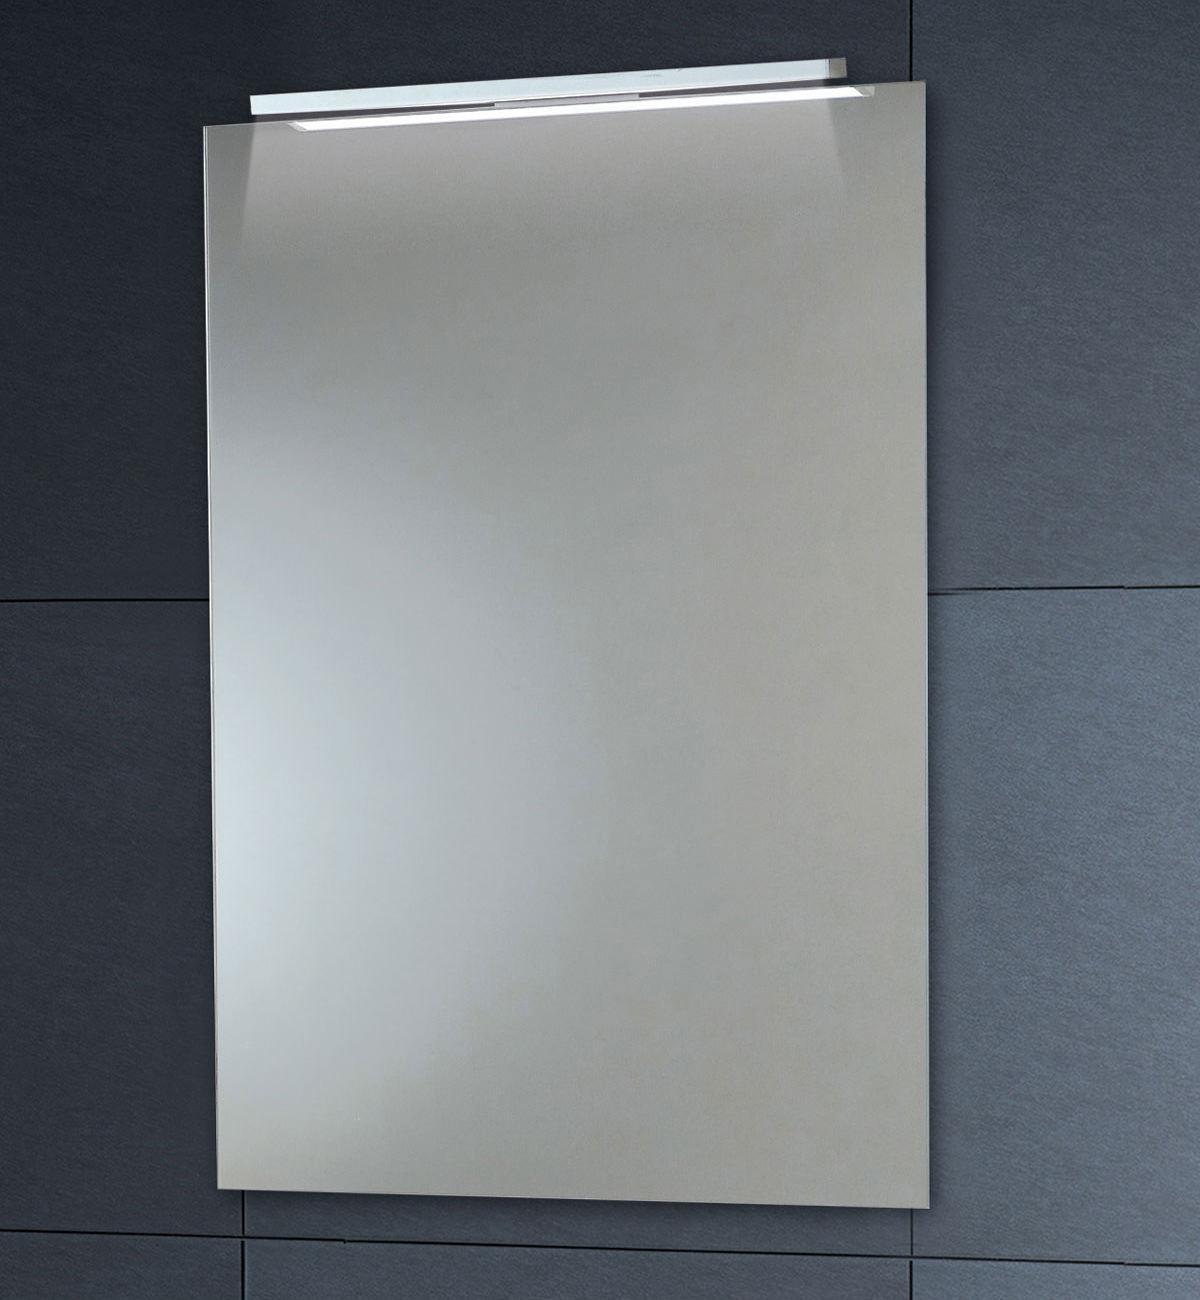 Bathroom mirrors demister